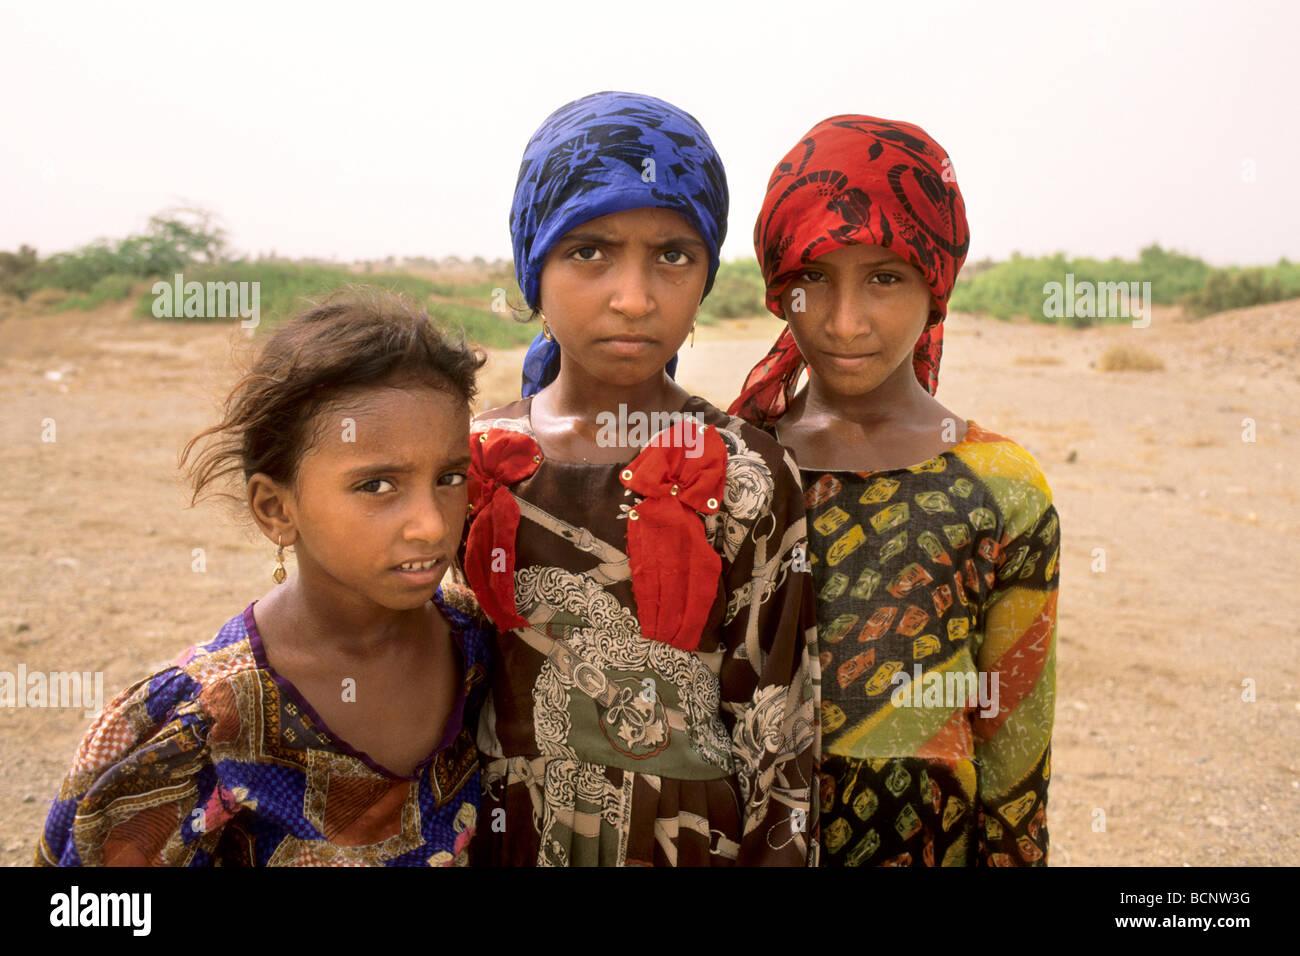 yemen Al Makha - Stock Image